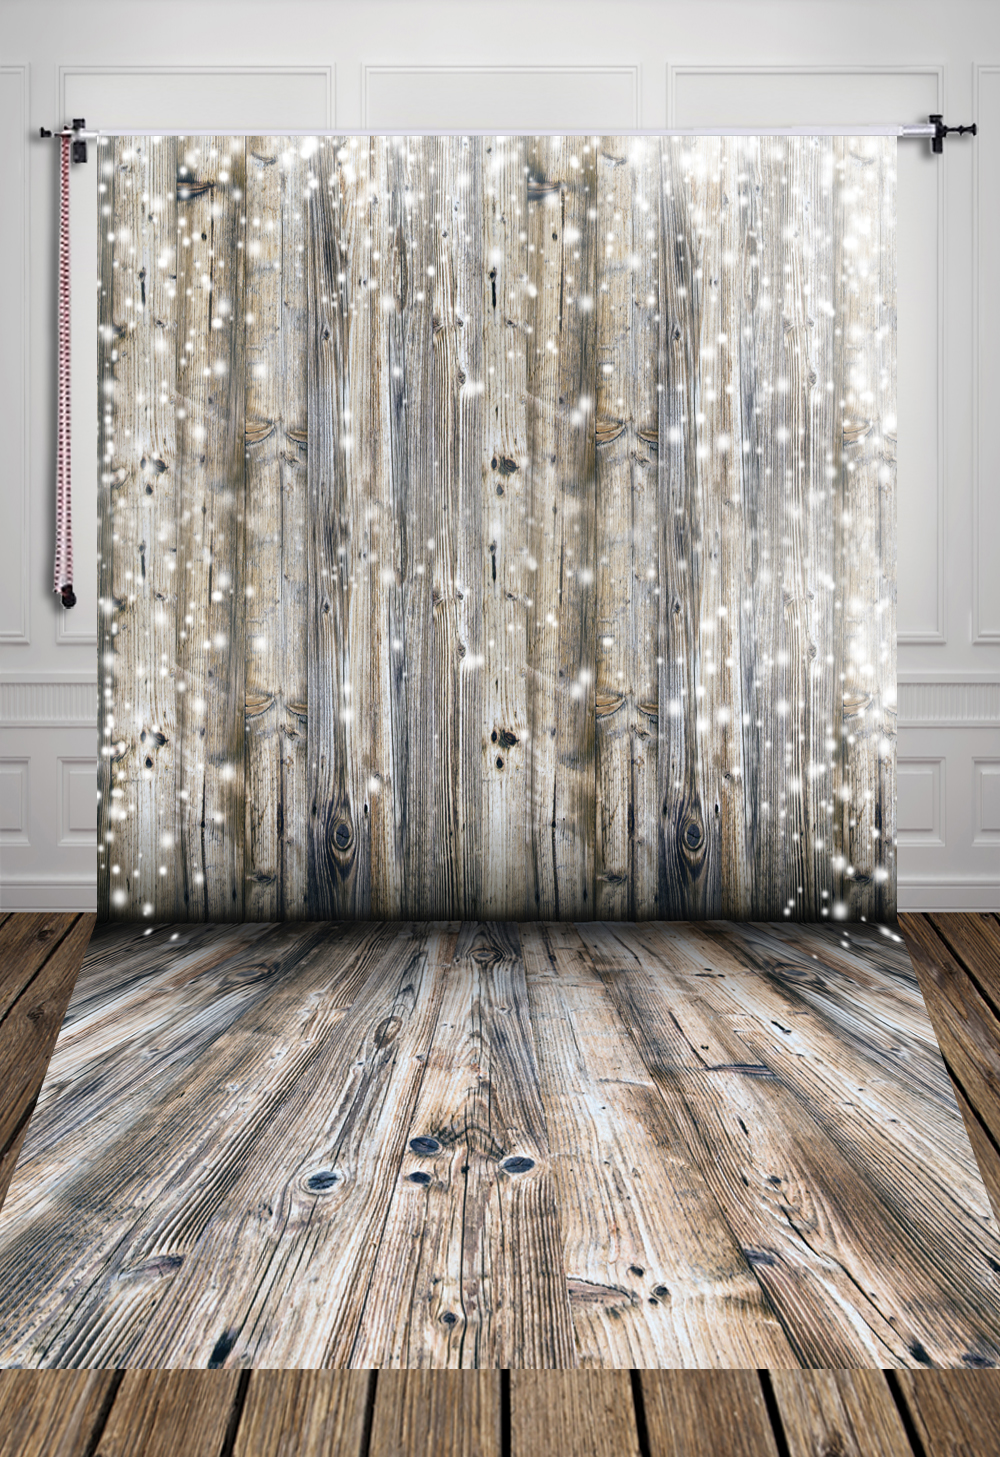 HUAYI Photography Backdrop christmas backdrops Photo Prop Christmas decoration Art Fabric backgrounds D2389